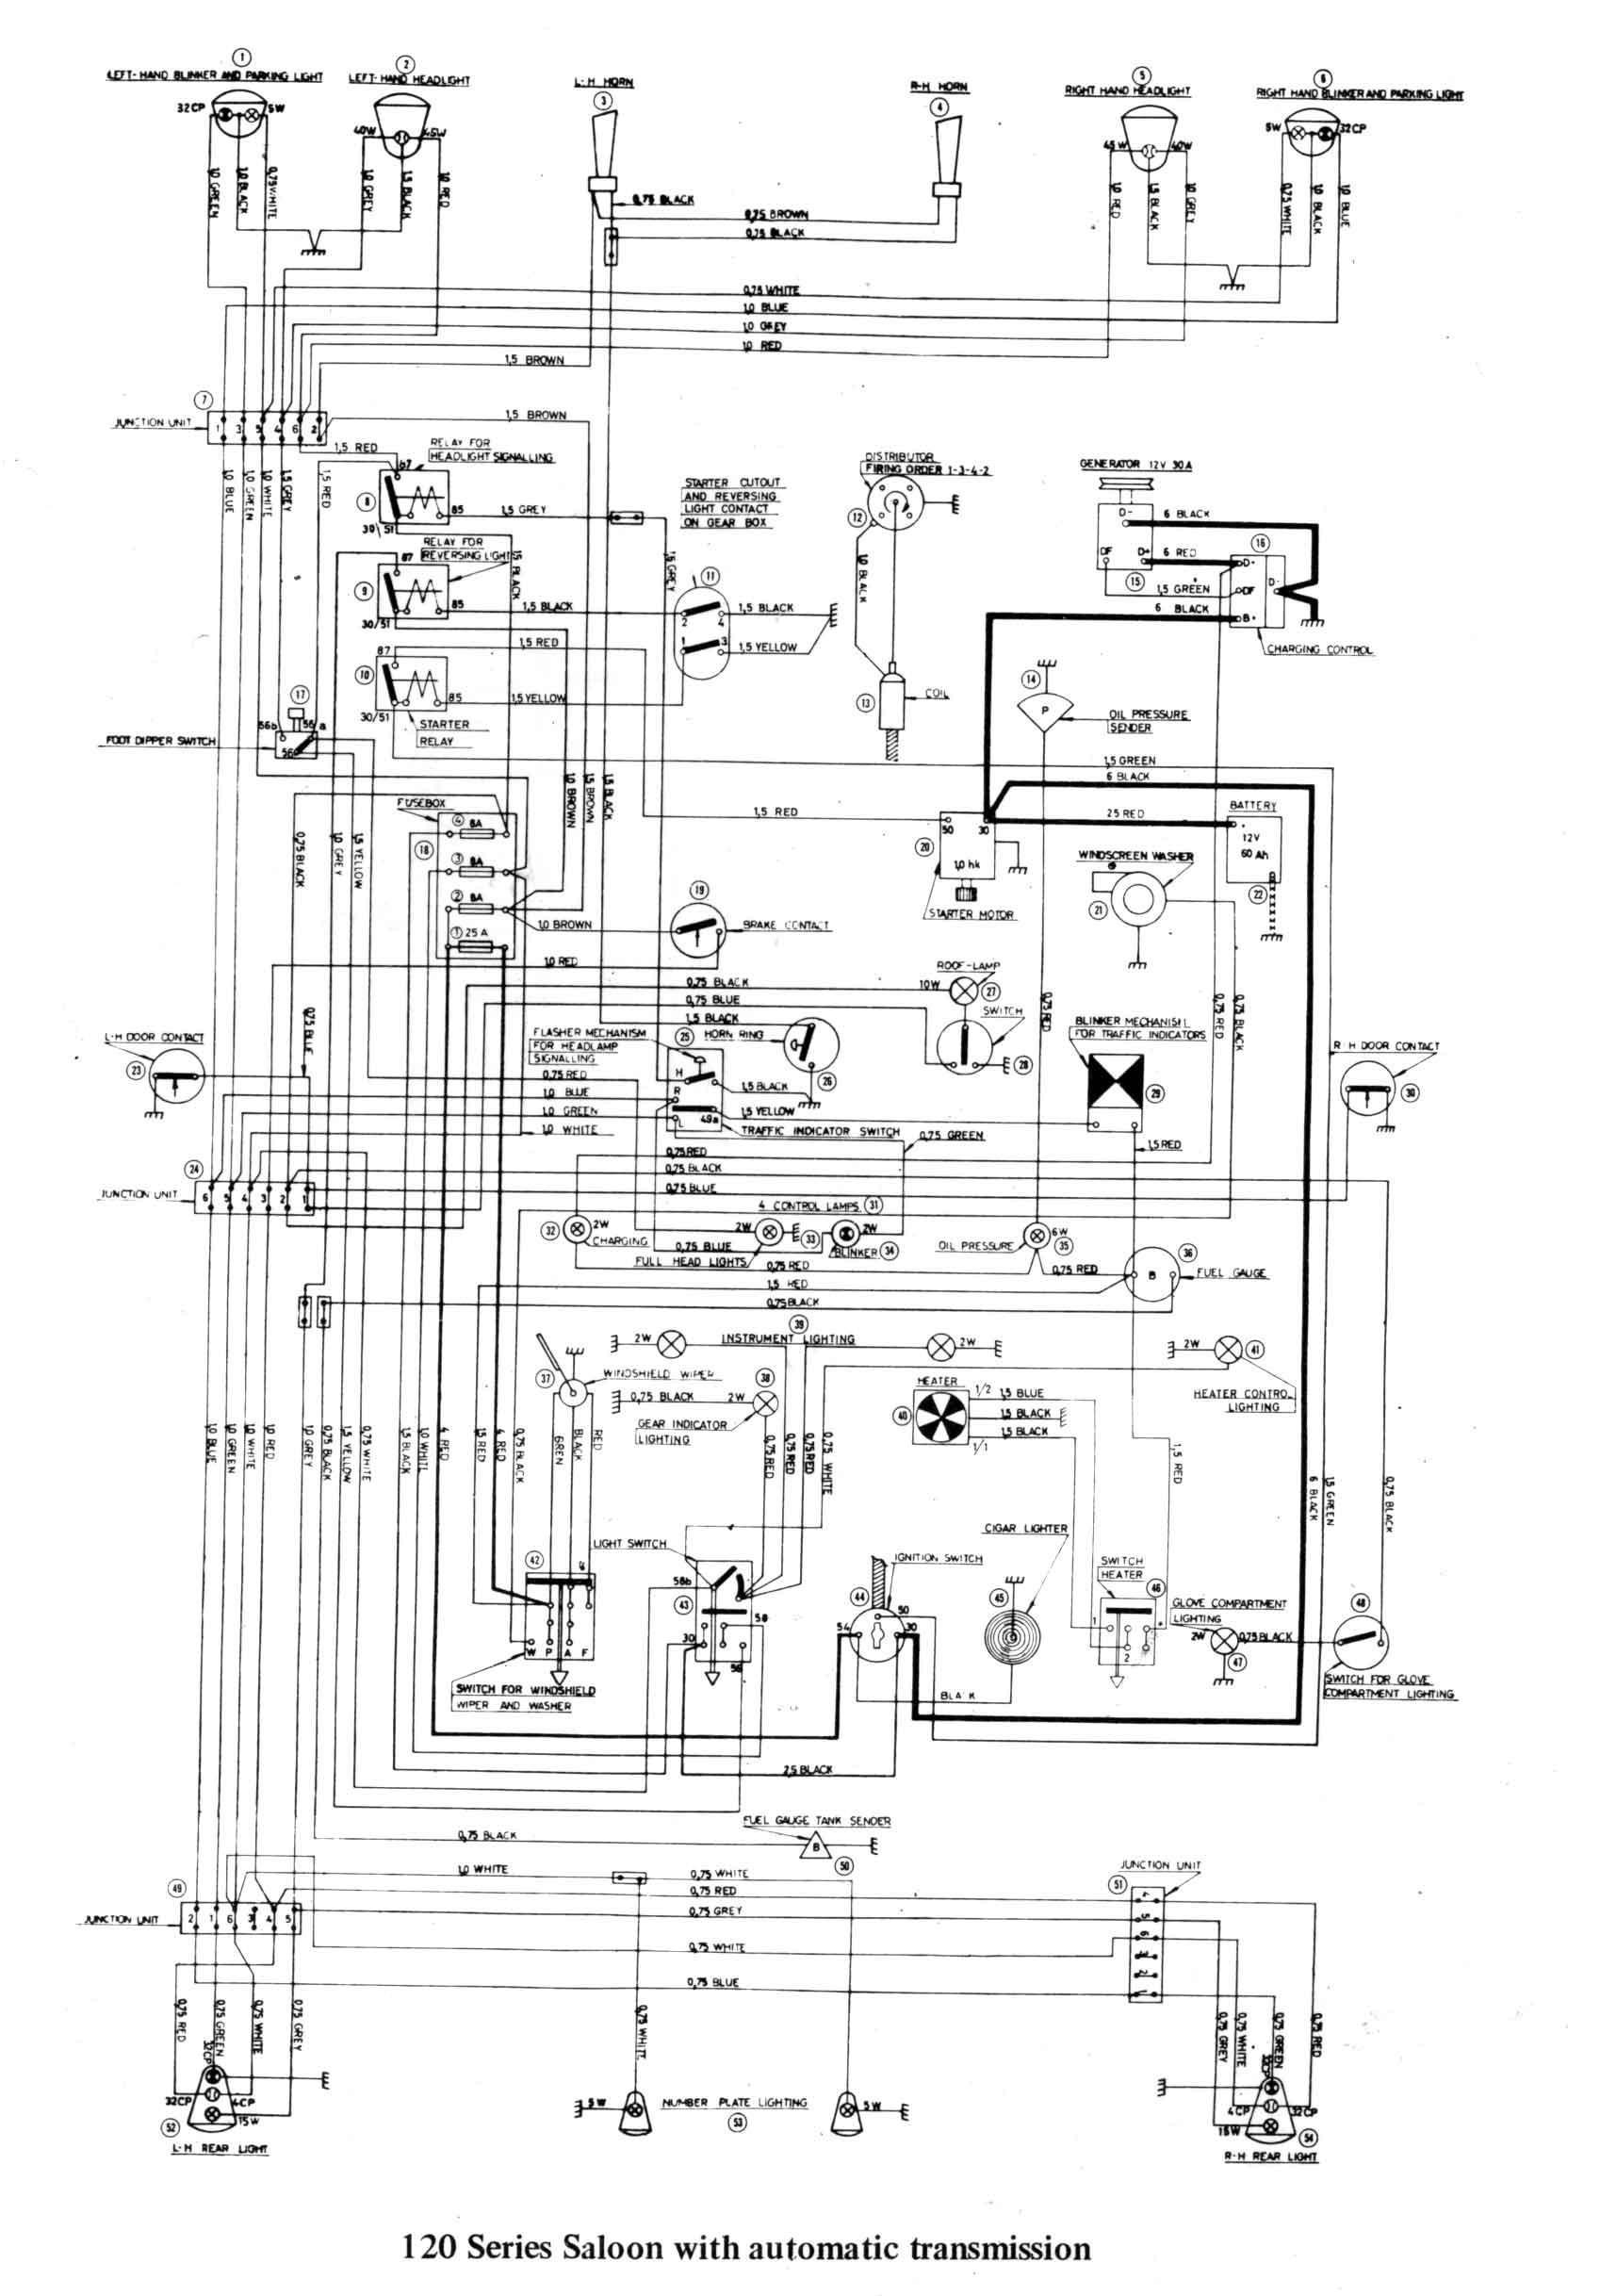 jcb alternator wiring diagram starter chevy turn signal unique image